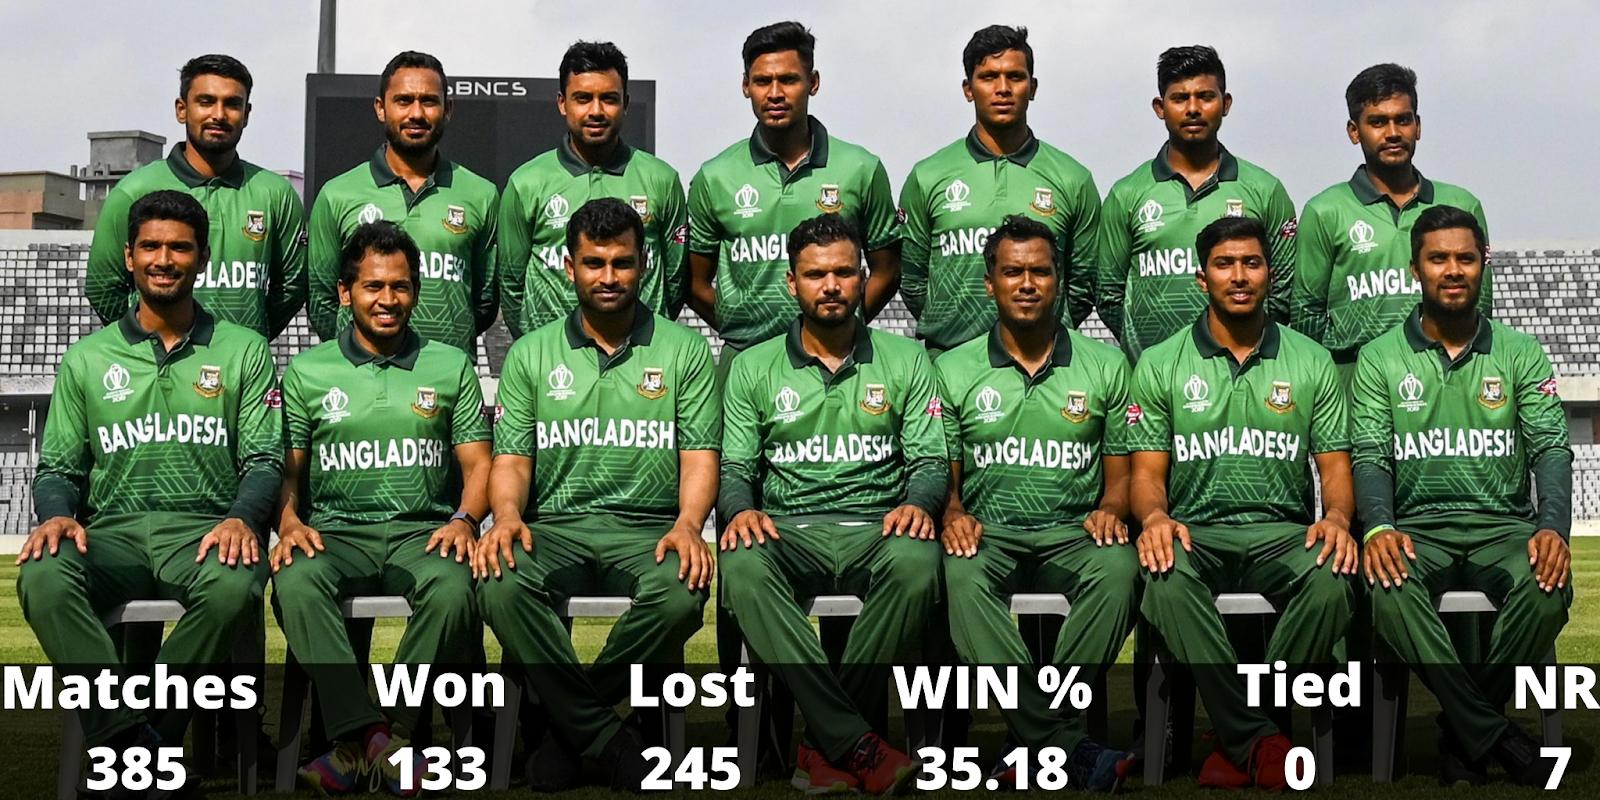 Most Wins in ODI By A International Cricket